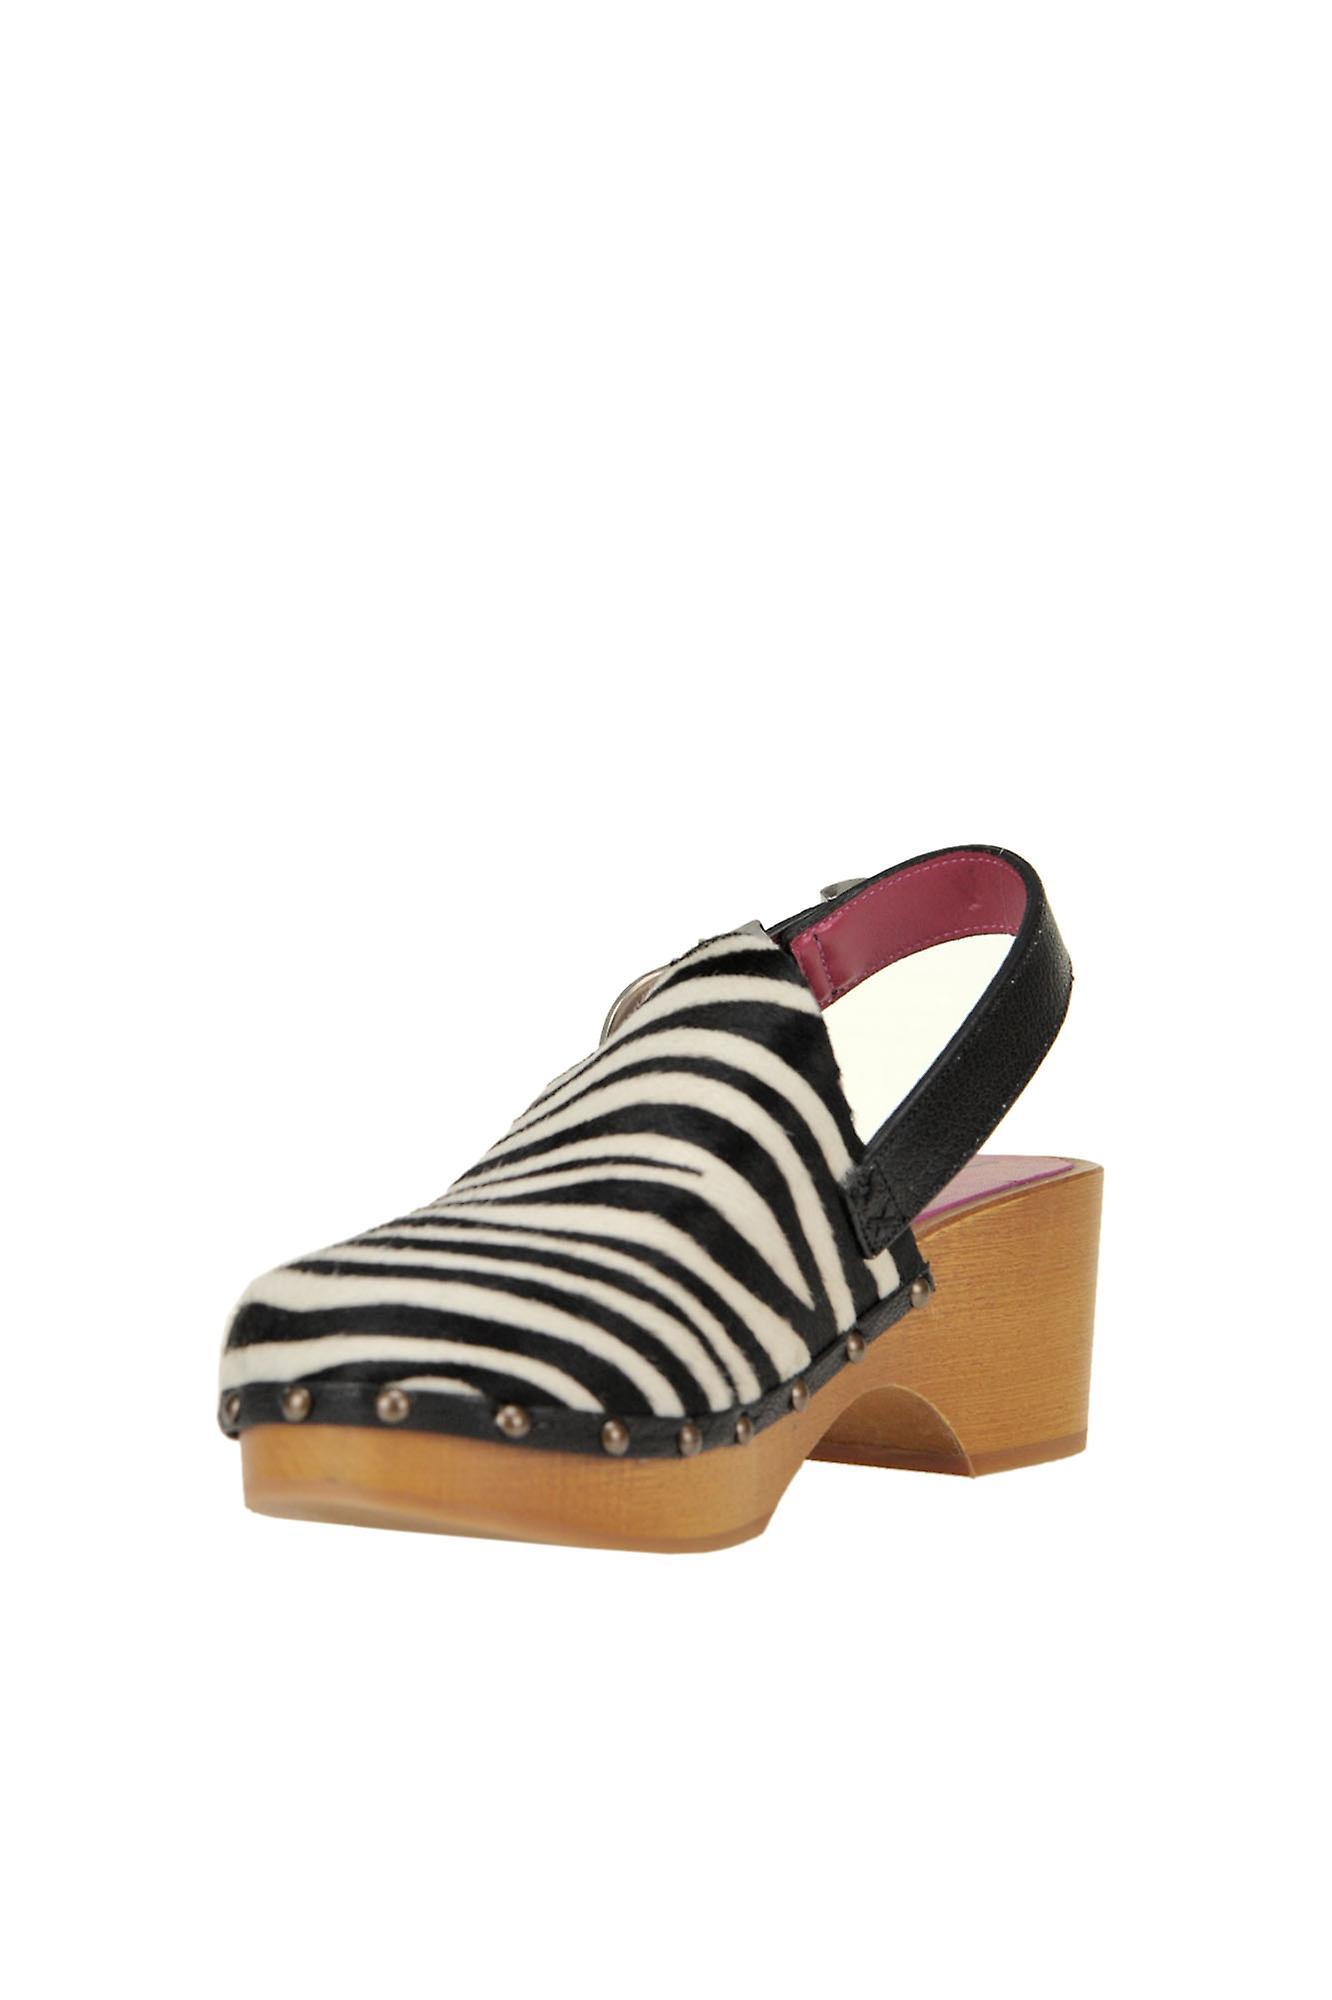 181 Ezgl315009 Women's White/black Pony Skin Slippers